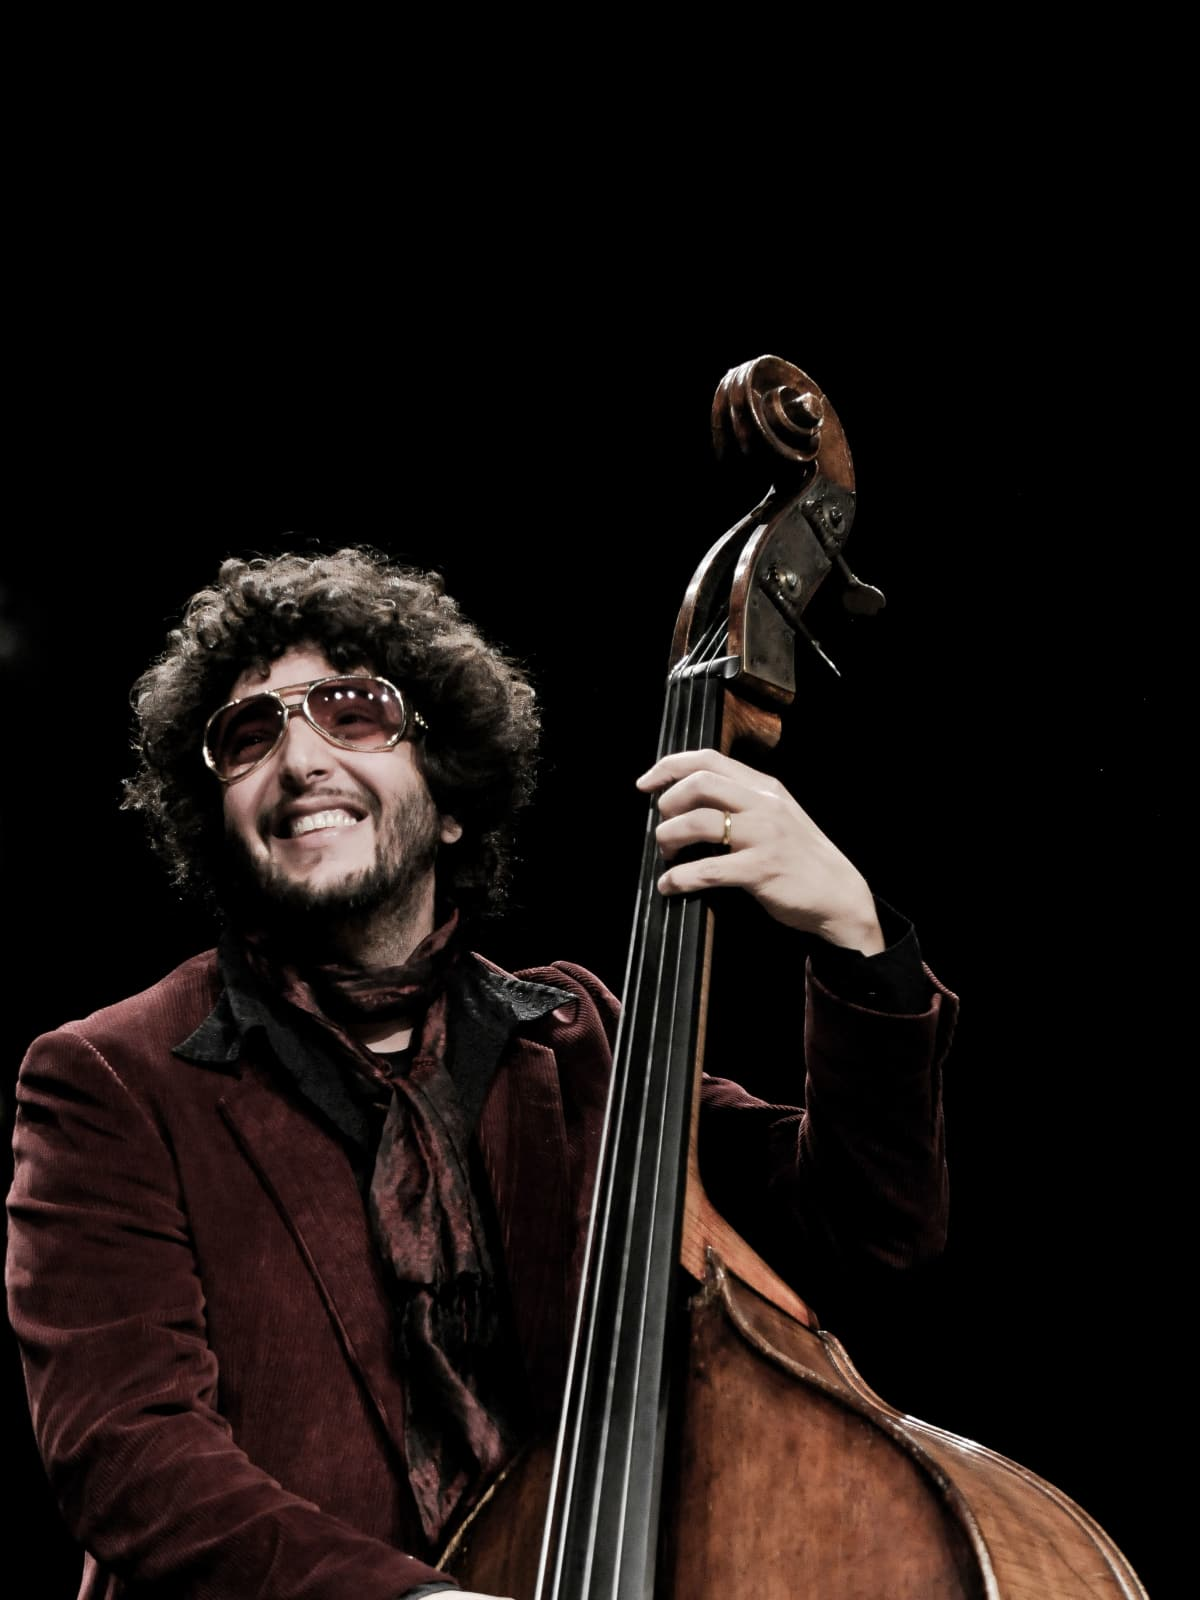 41st Annual Jewish Book & Arts Fair: Omer Avital Quintet concert